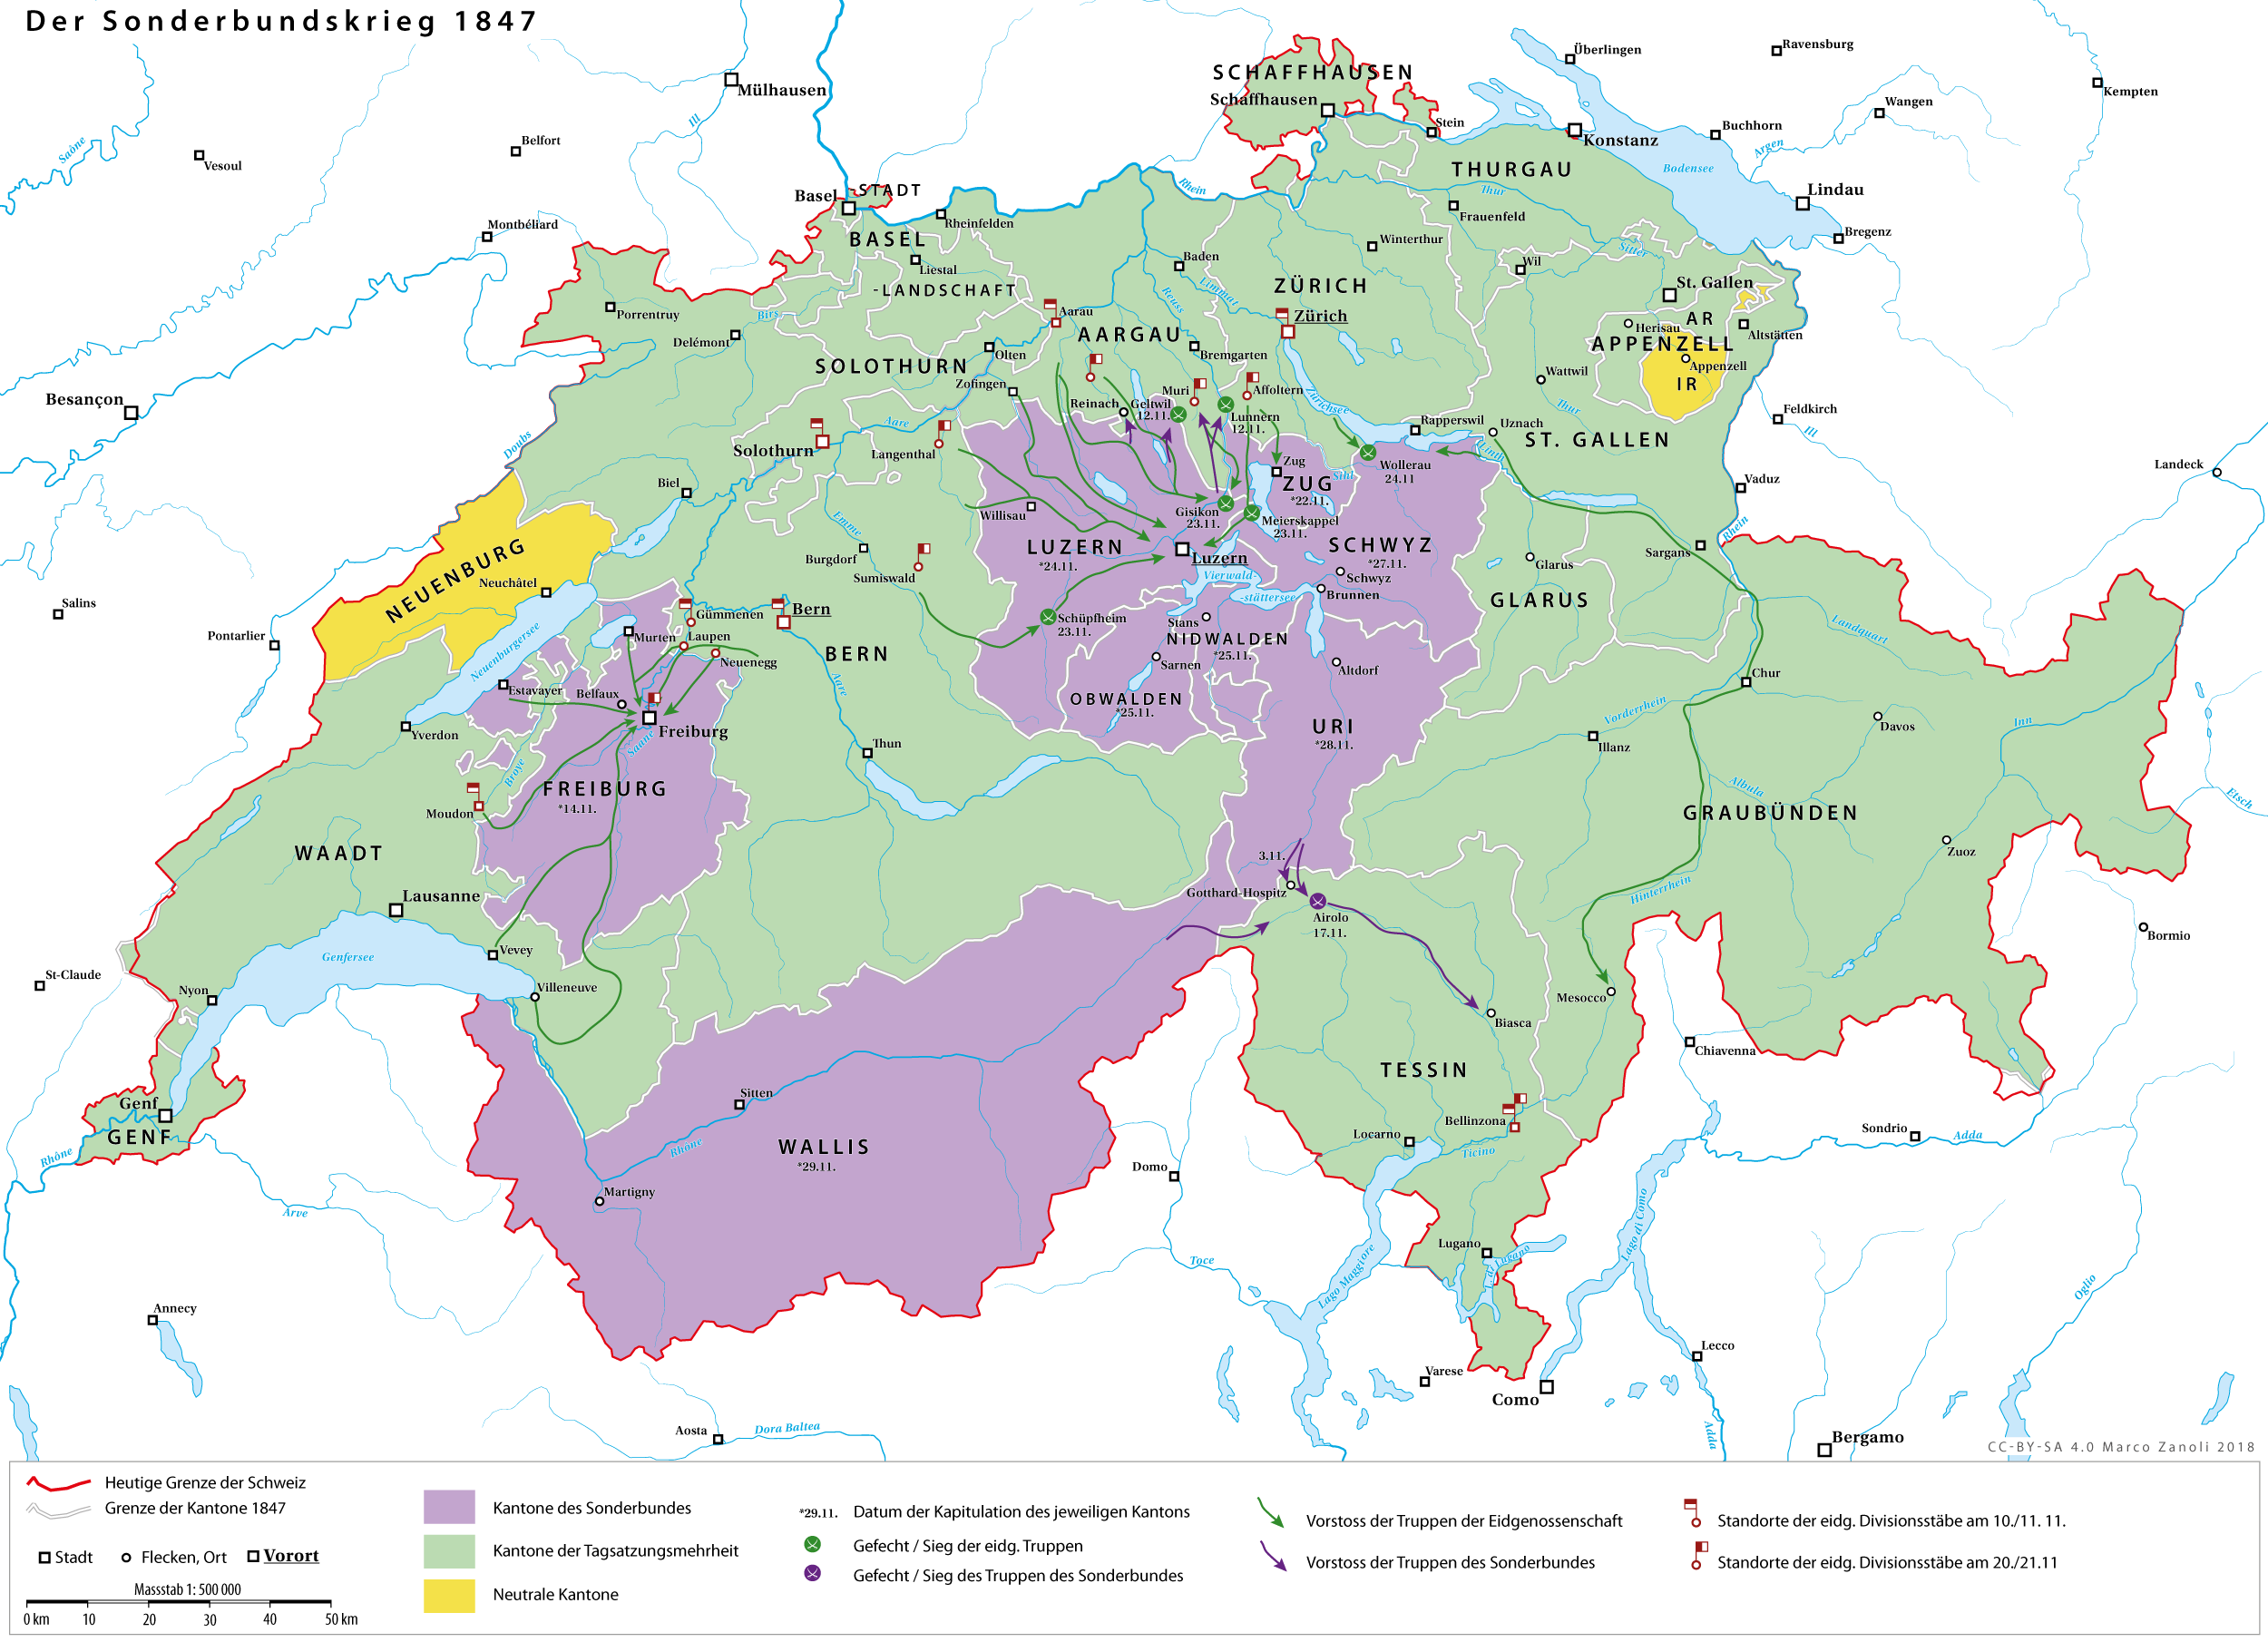 blog318-08_karte_sonderbundskrieg_1847.png